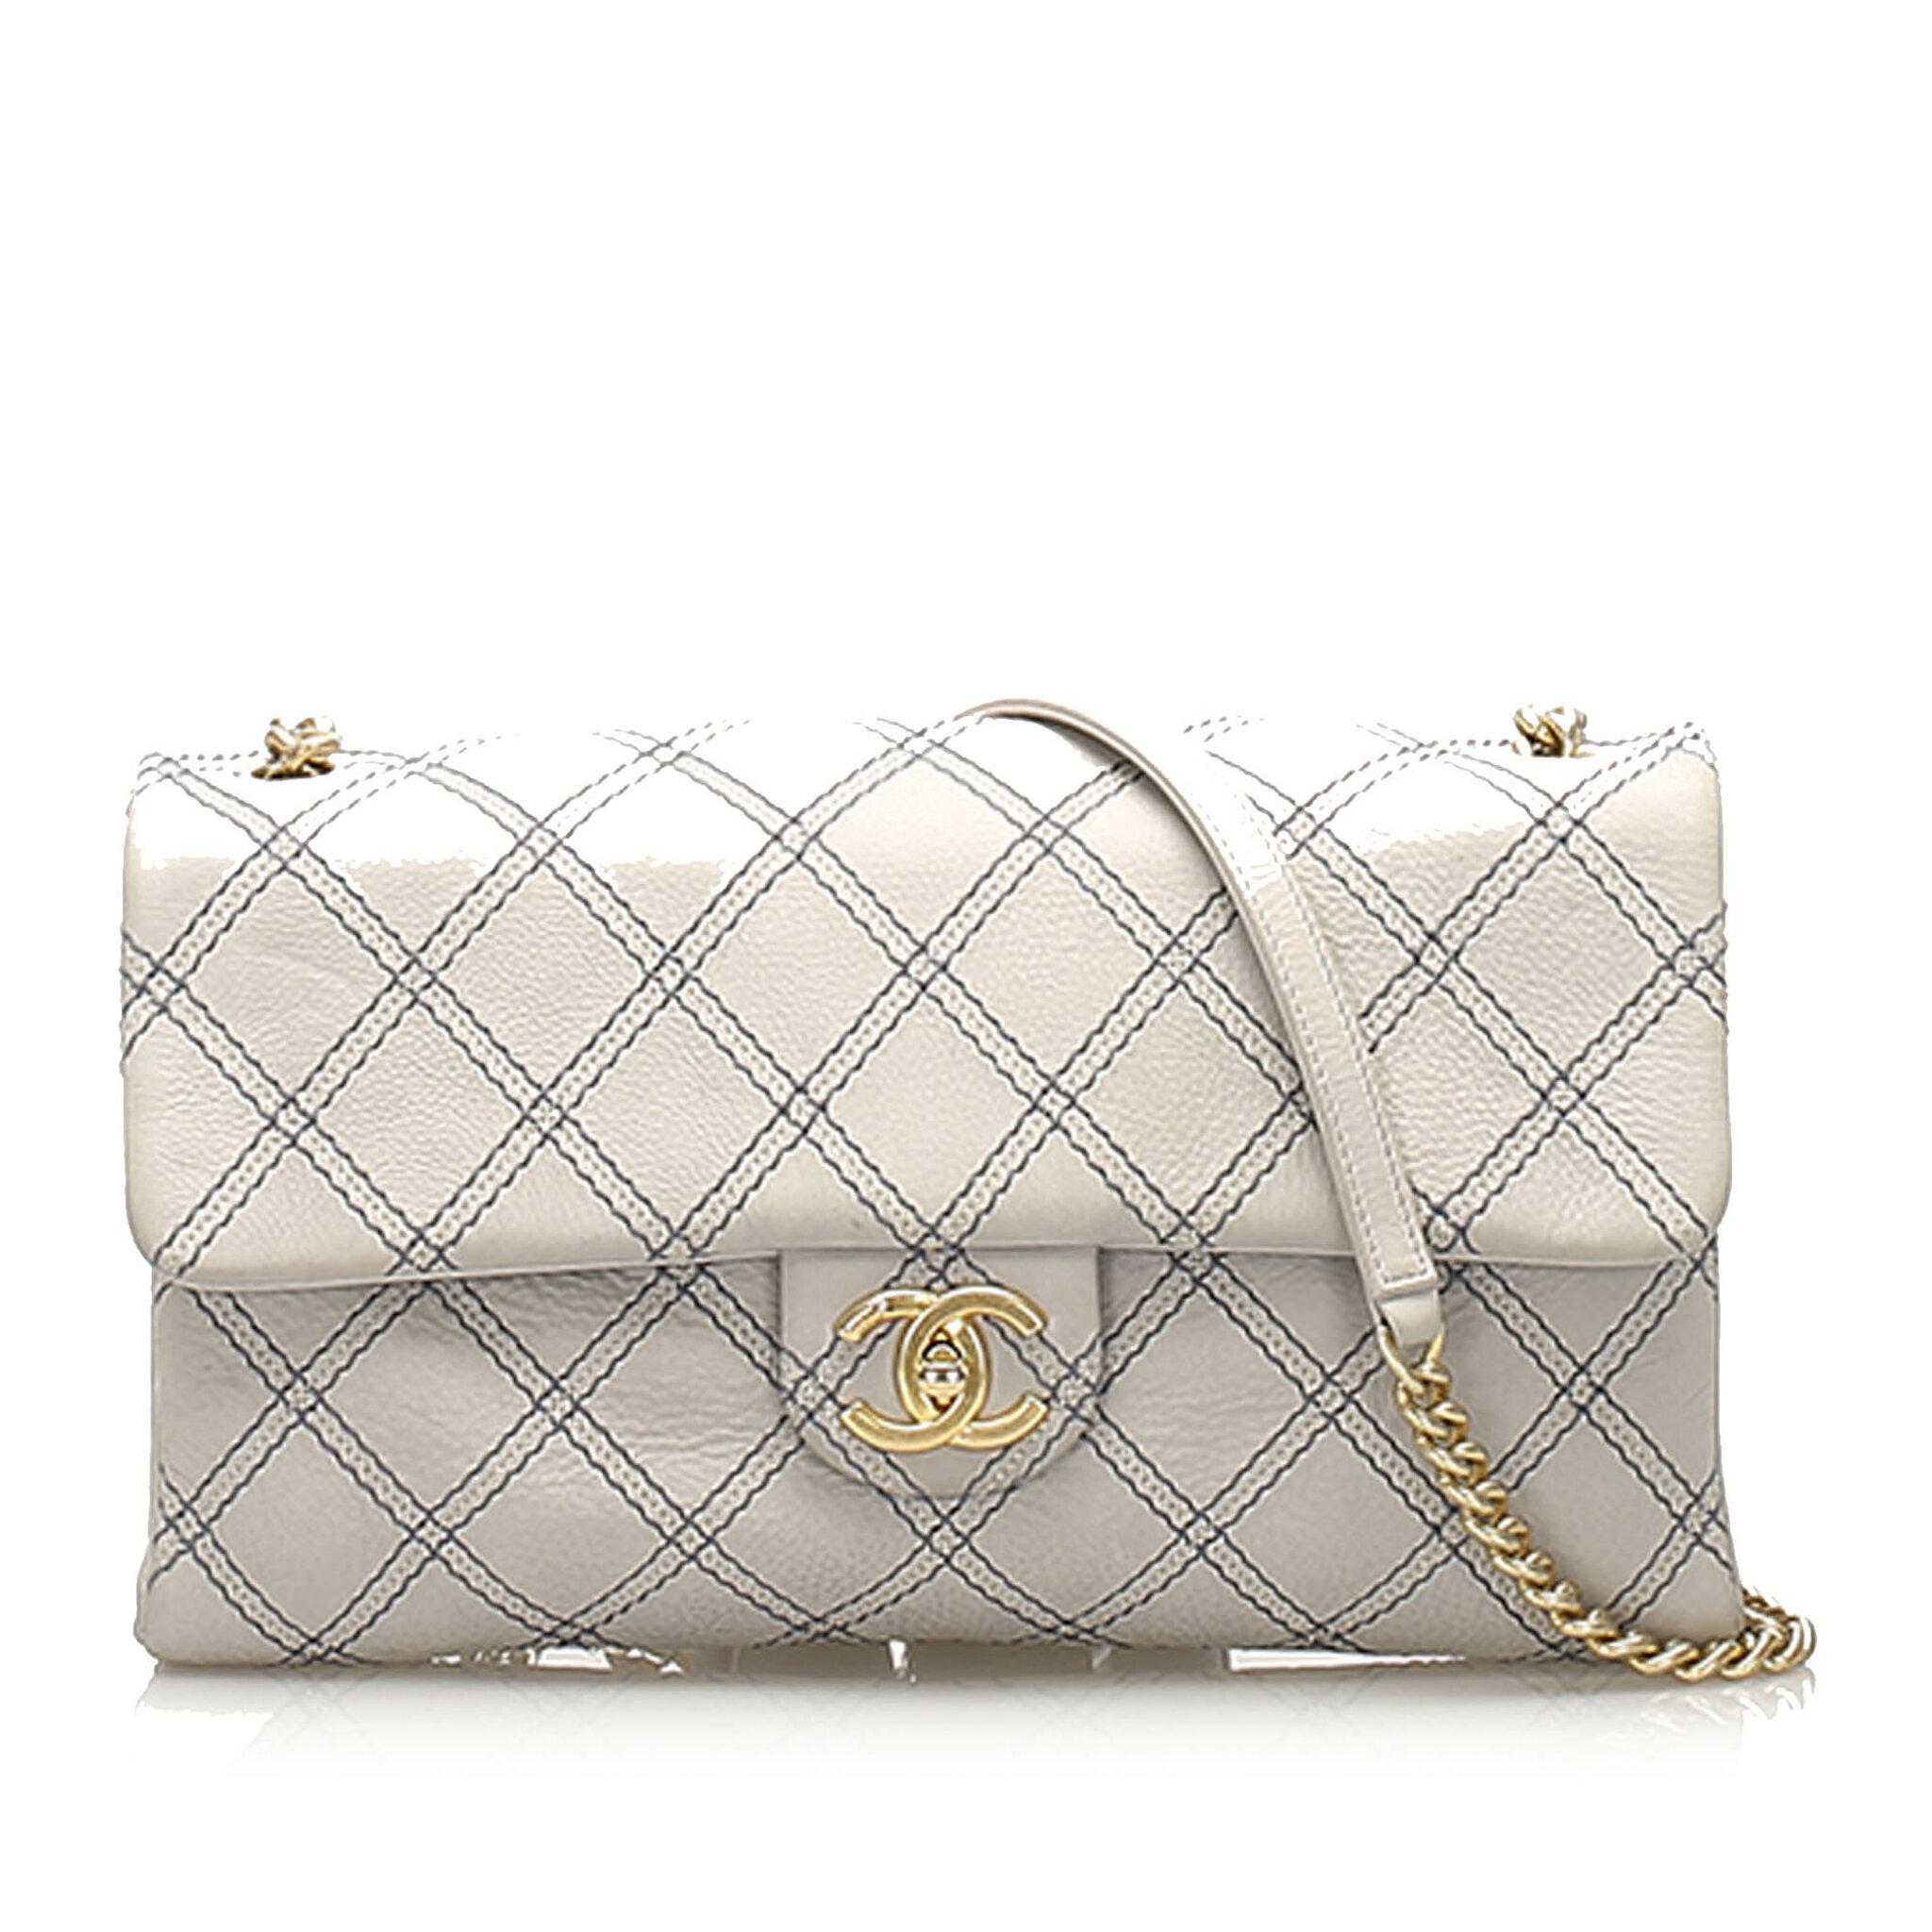 Chanel Cc Turnlock Timeless Lambskin Leather Flap